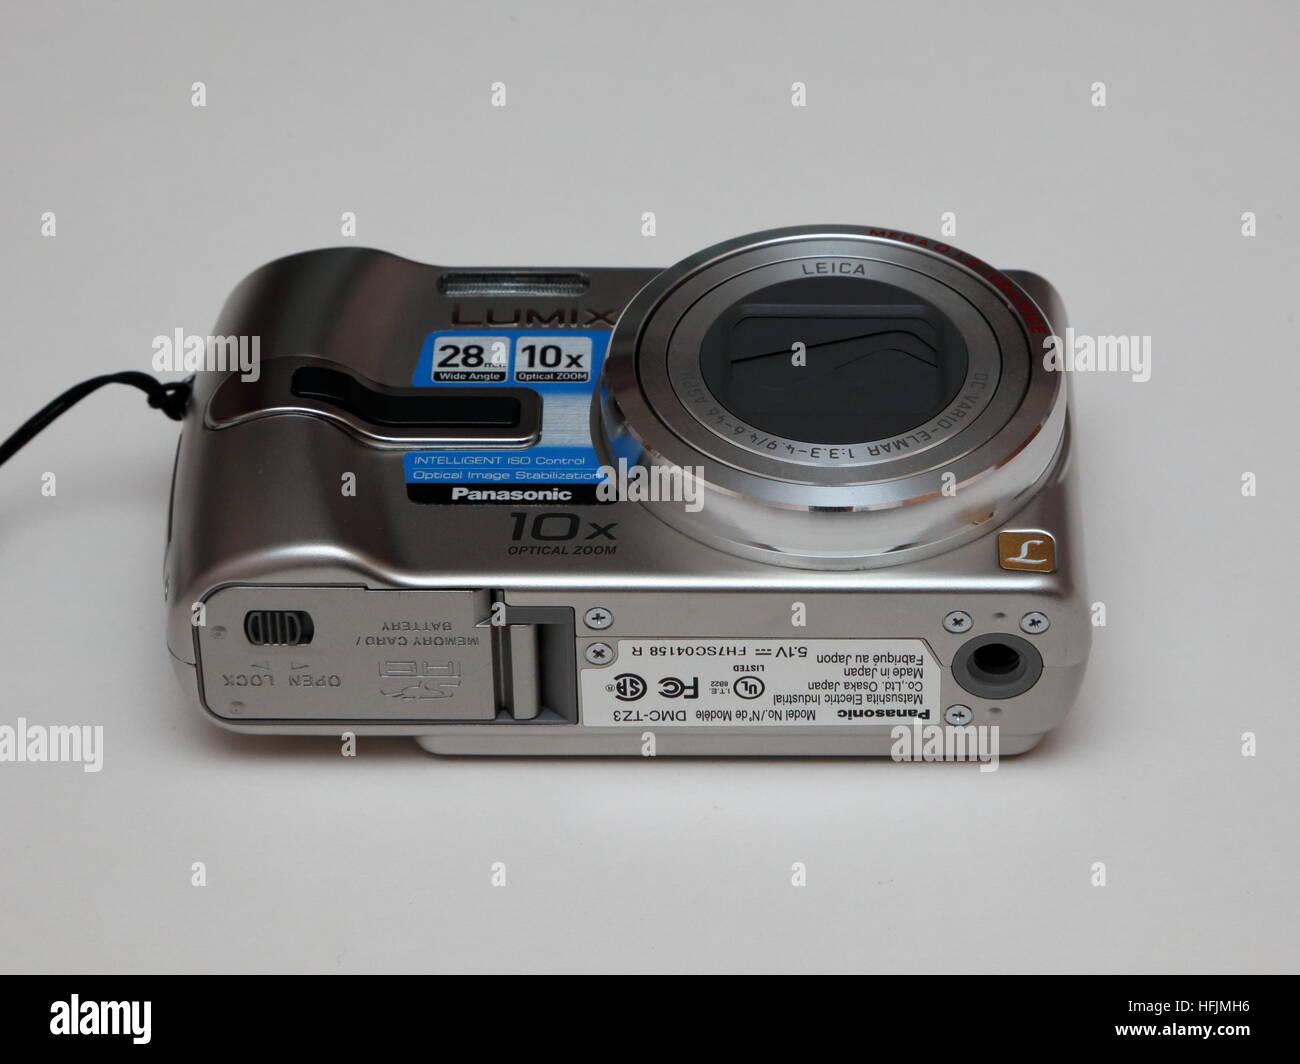 Panasonic Lumix DMC-TZ3 7.2Mpx Digital compact camera showing underside - Stock Image